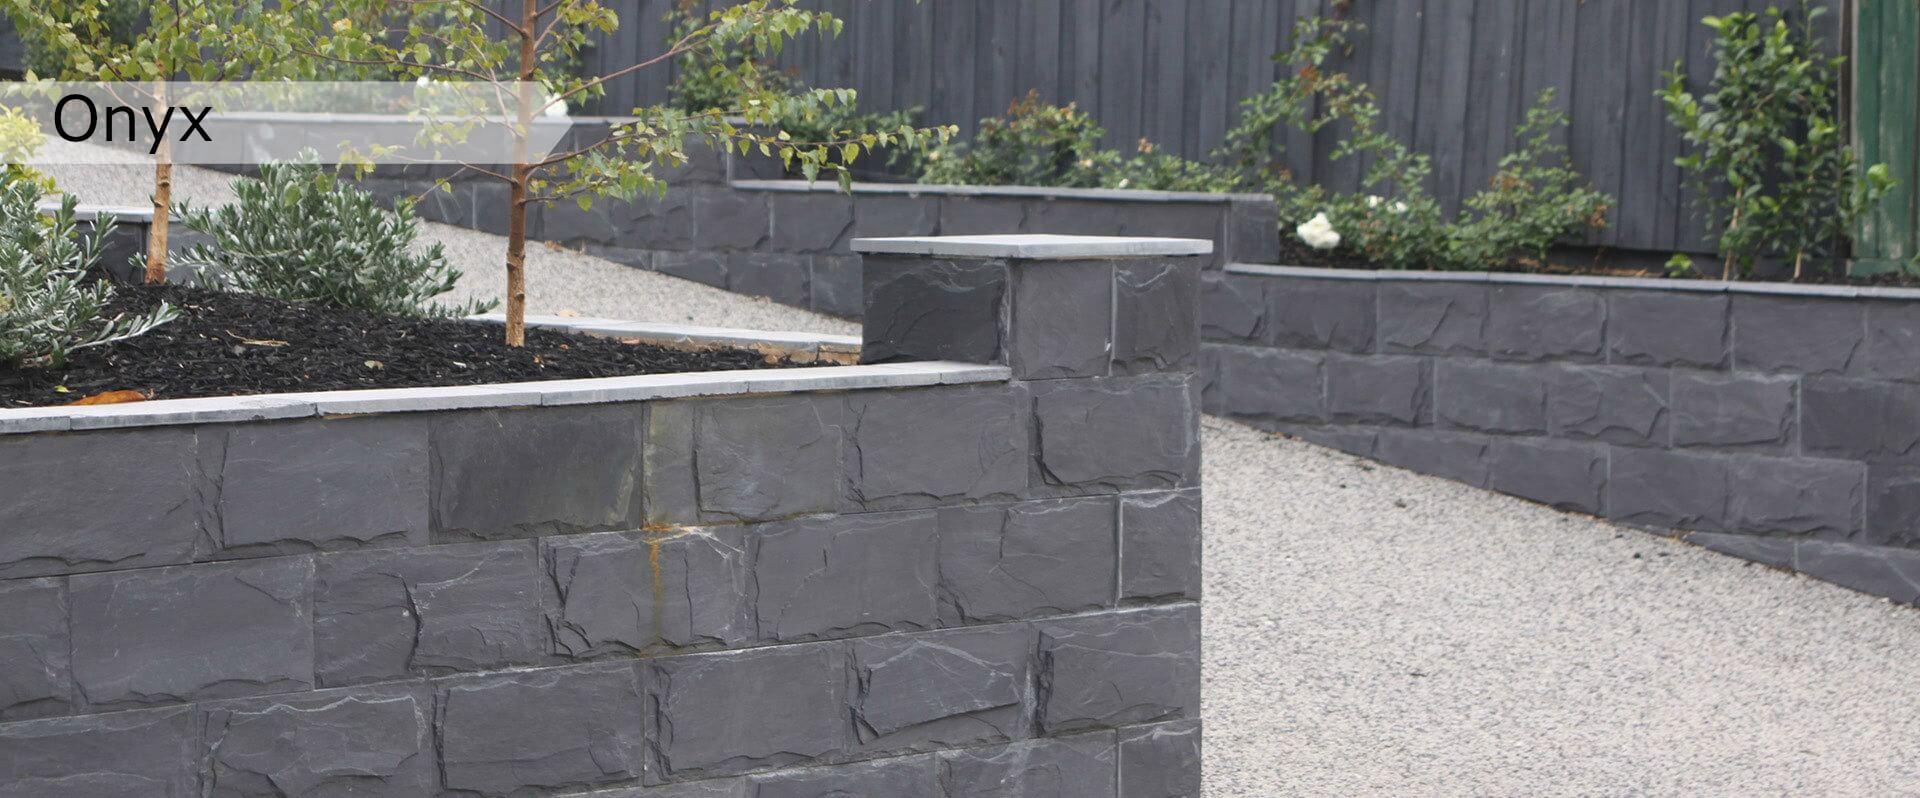 Ardesia Stone Cladding, Outdoor Tiles in Melbourne, Sydney & Brisbane